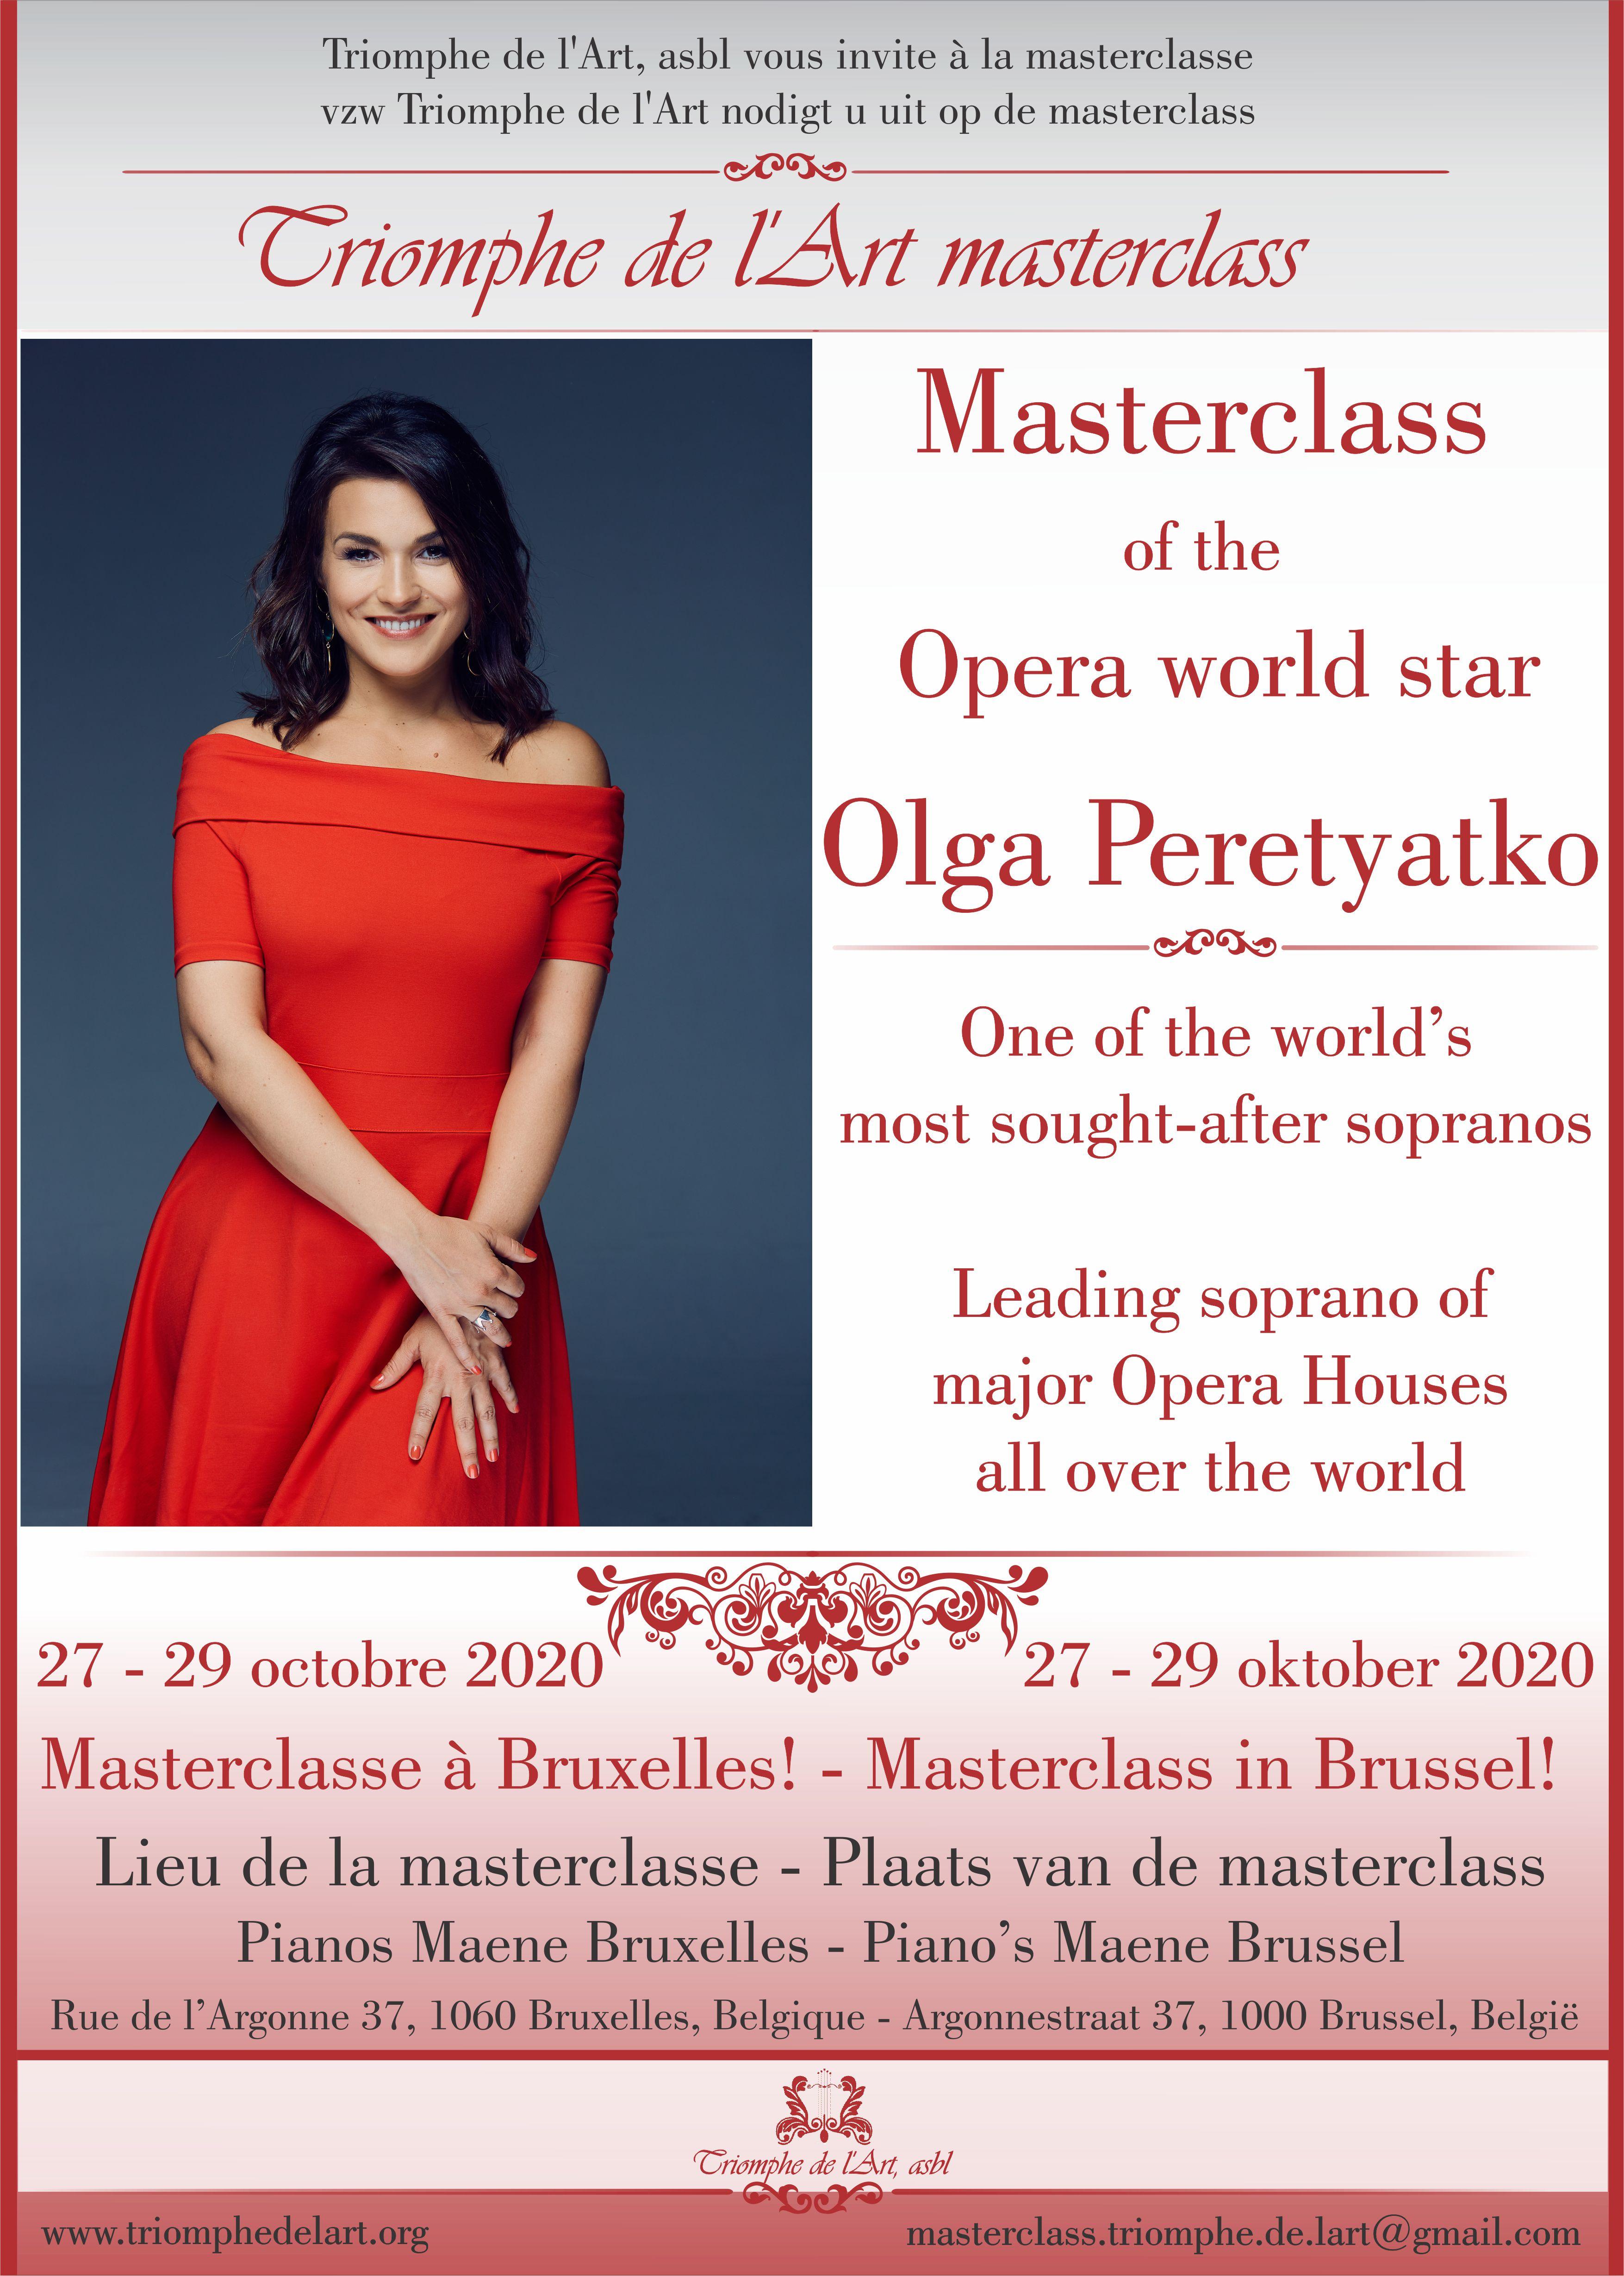 Olga Peretyatko masterclass